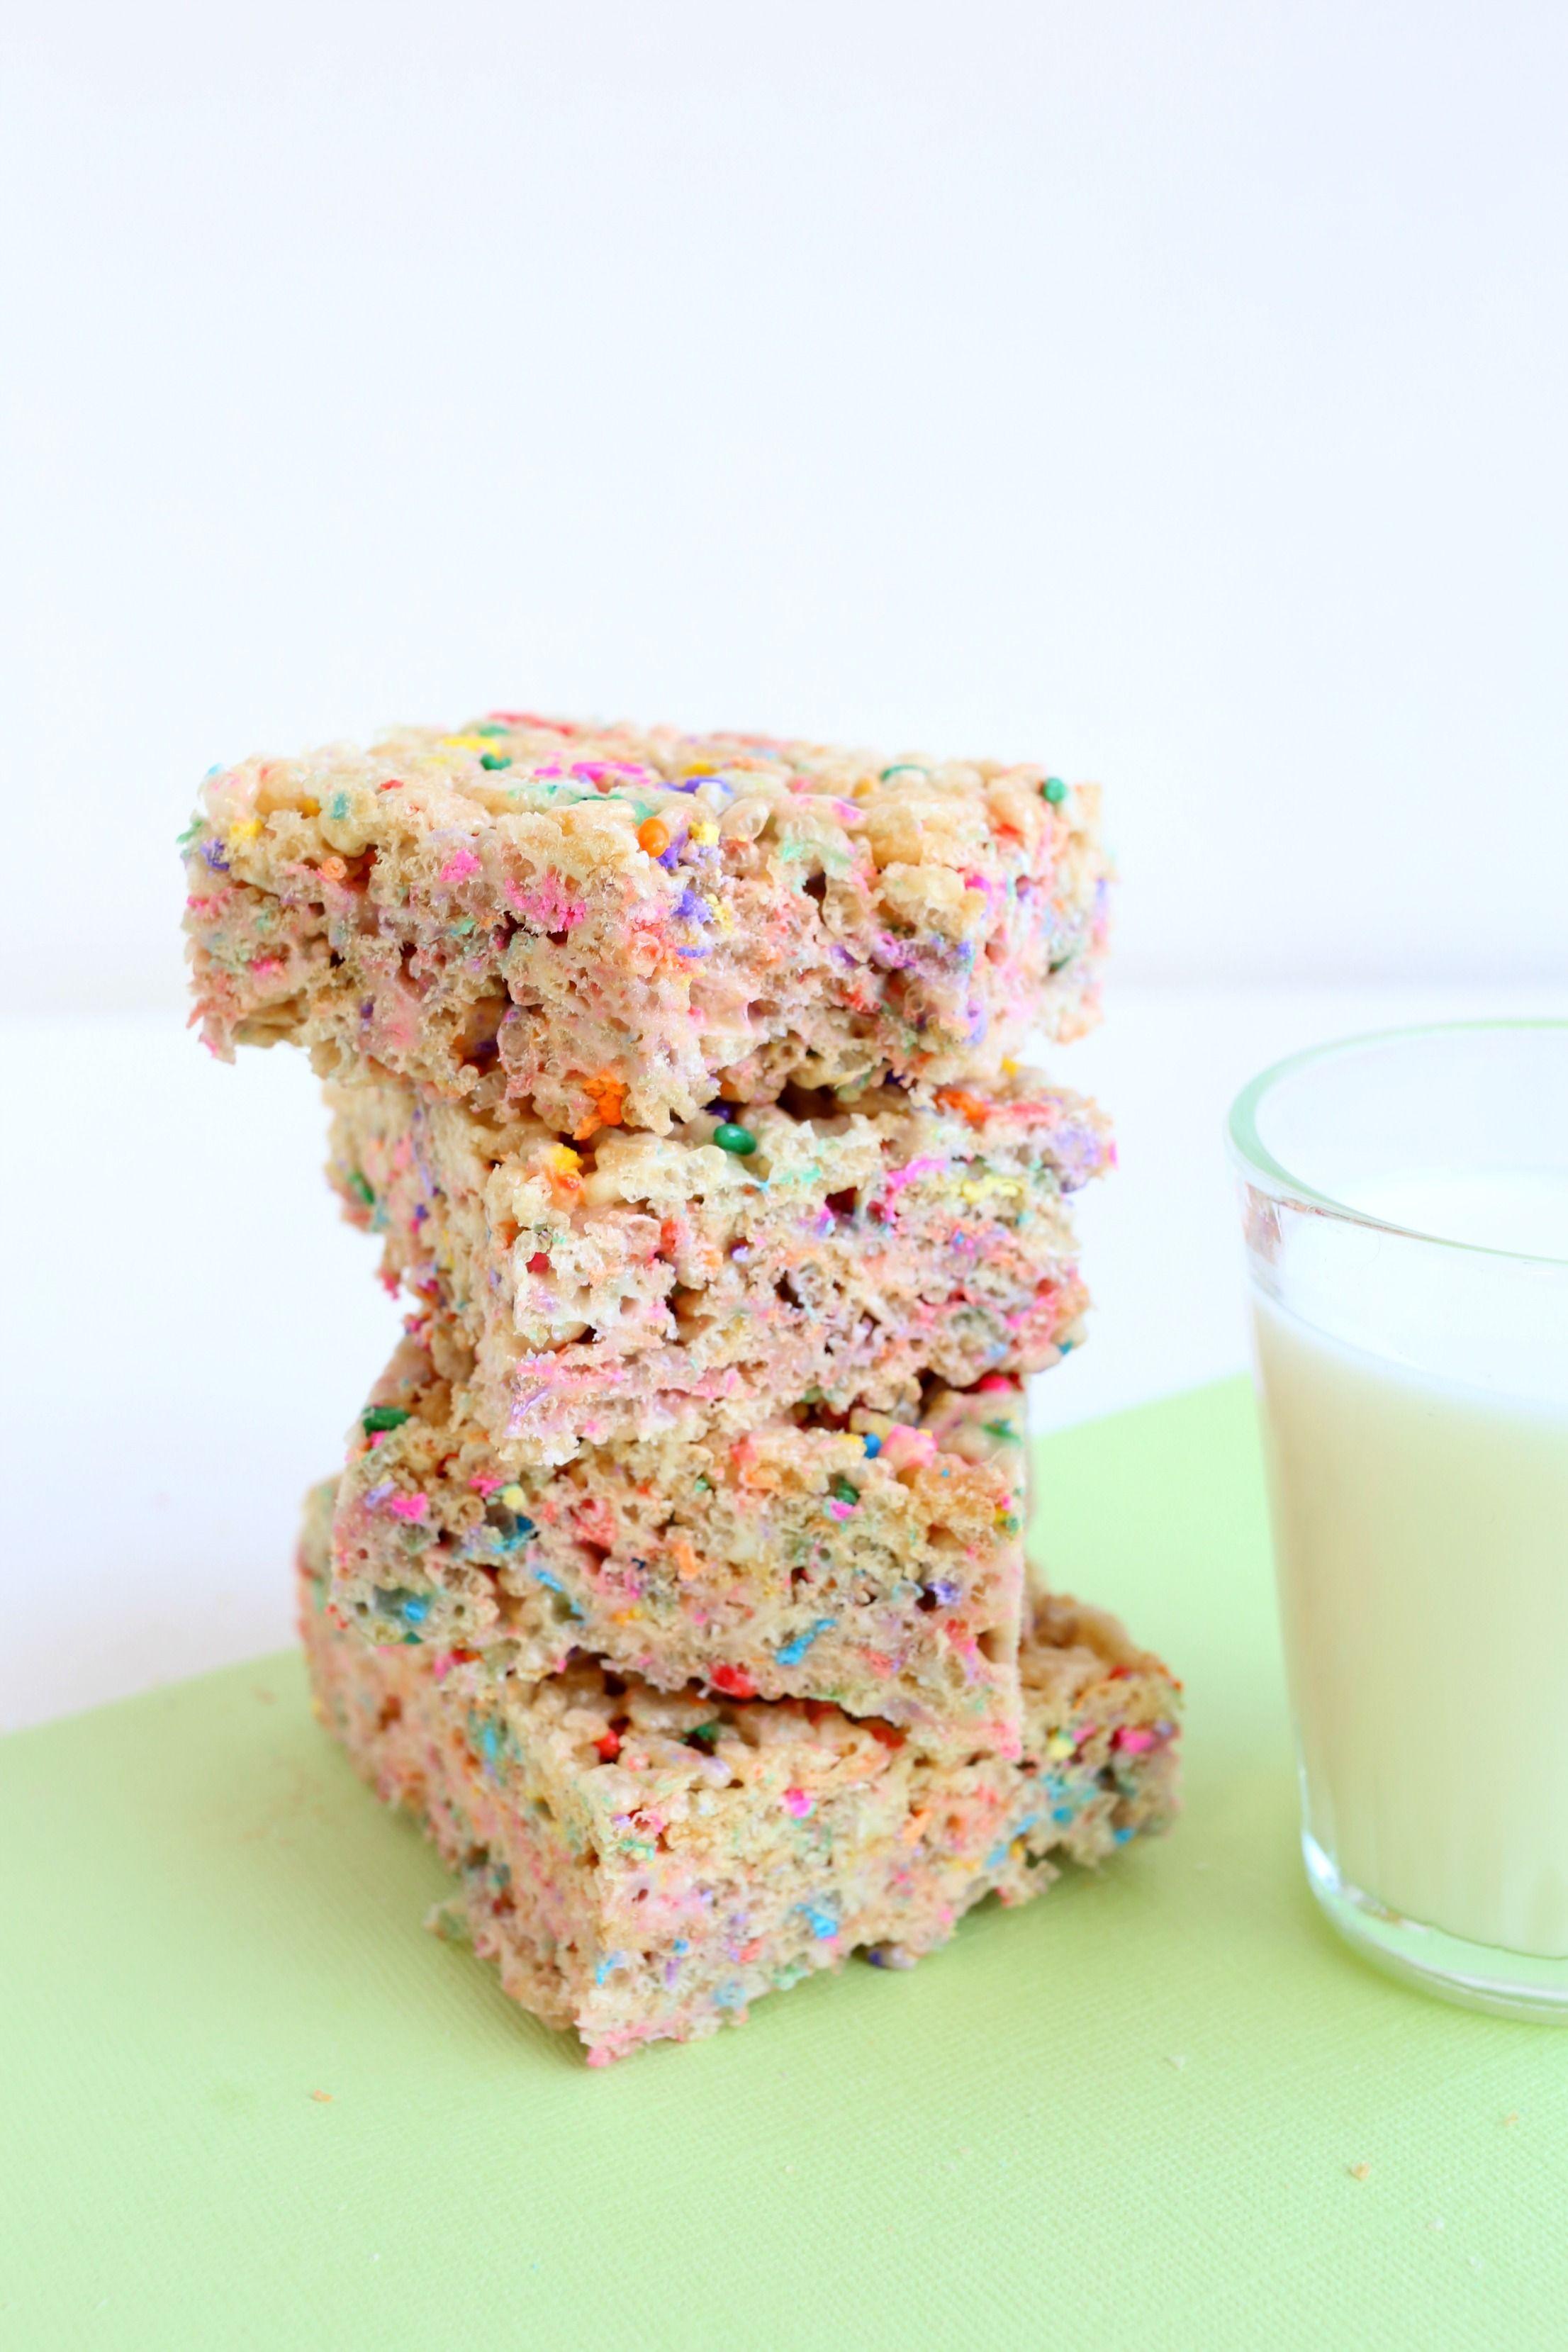 Bright Sprinkles Turn The Classic Dessert Into Birthday Cake Rice